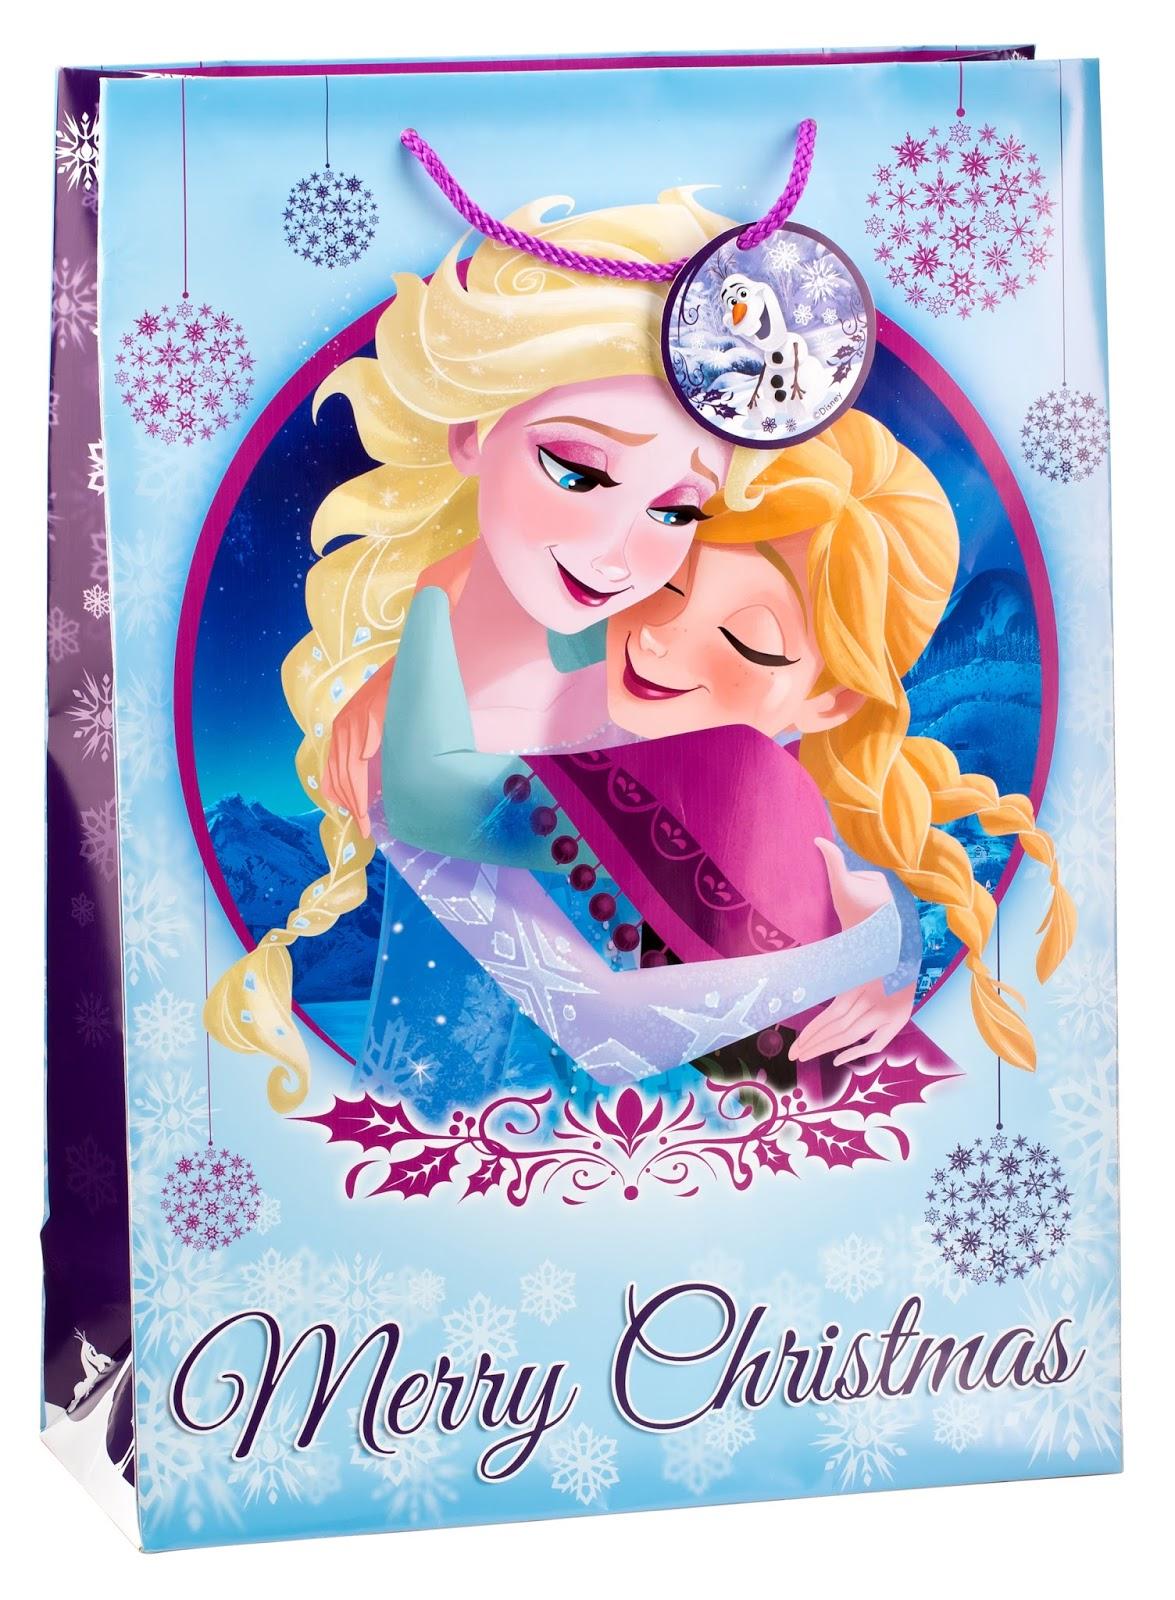 Christmas Decorating Theme: Kids' Kitsch & a Frenzy of Frozen!